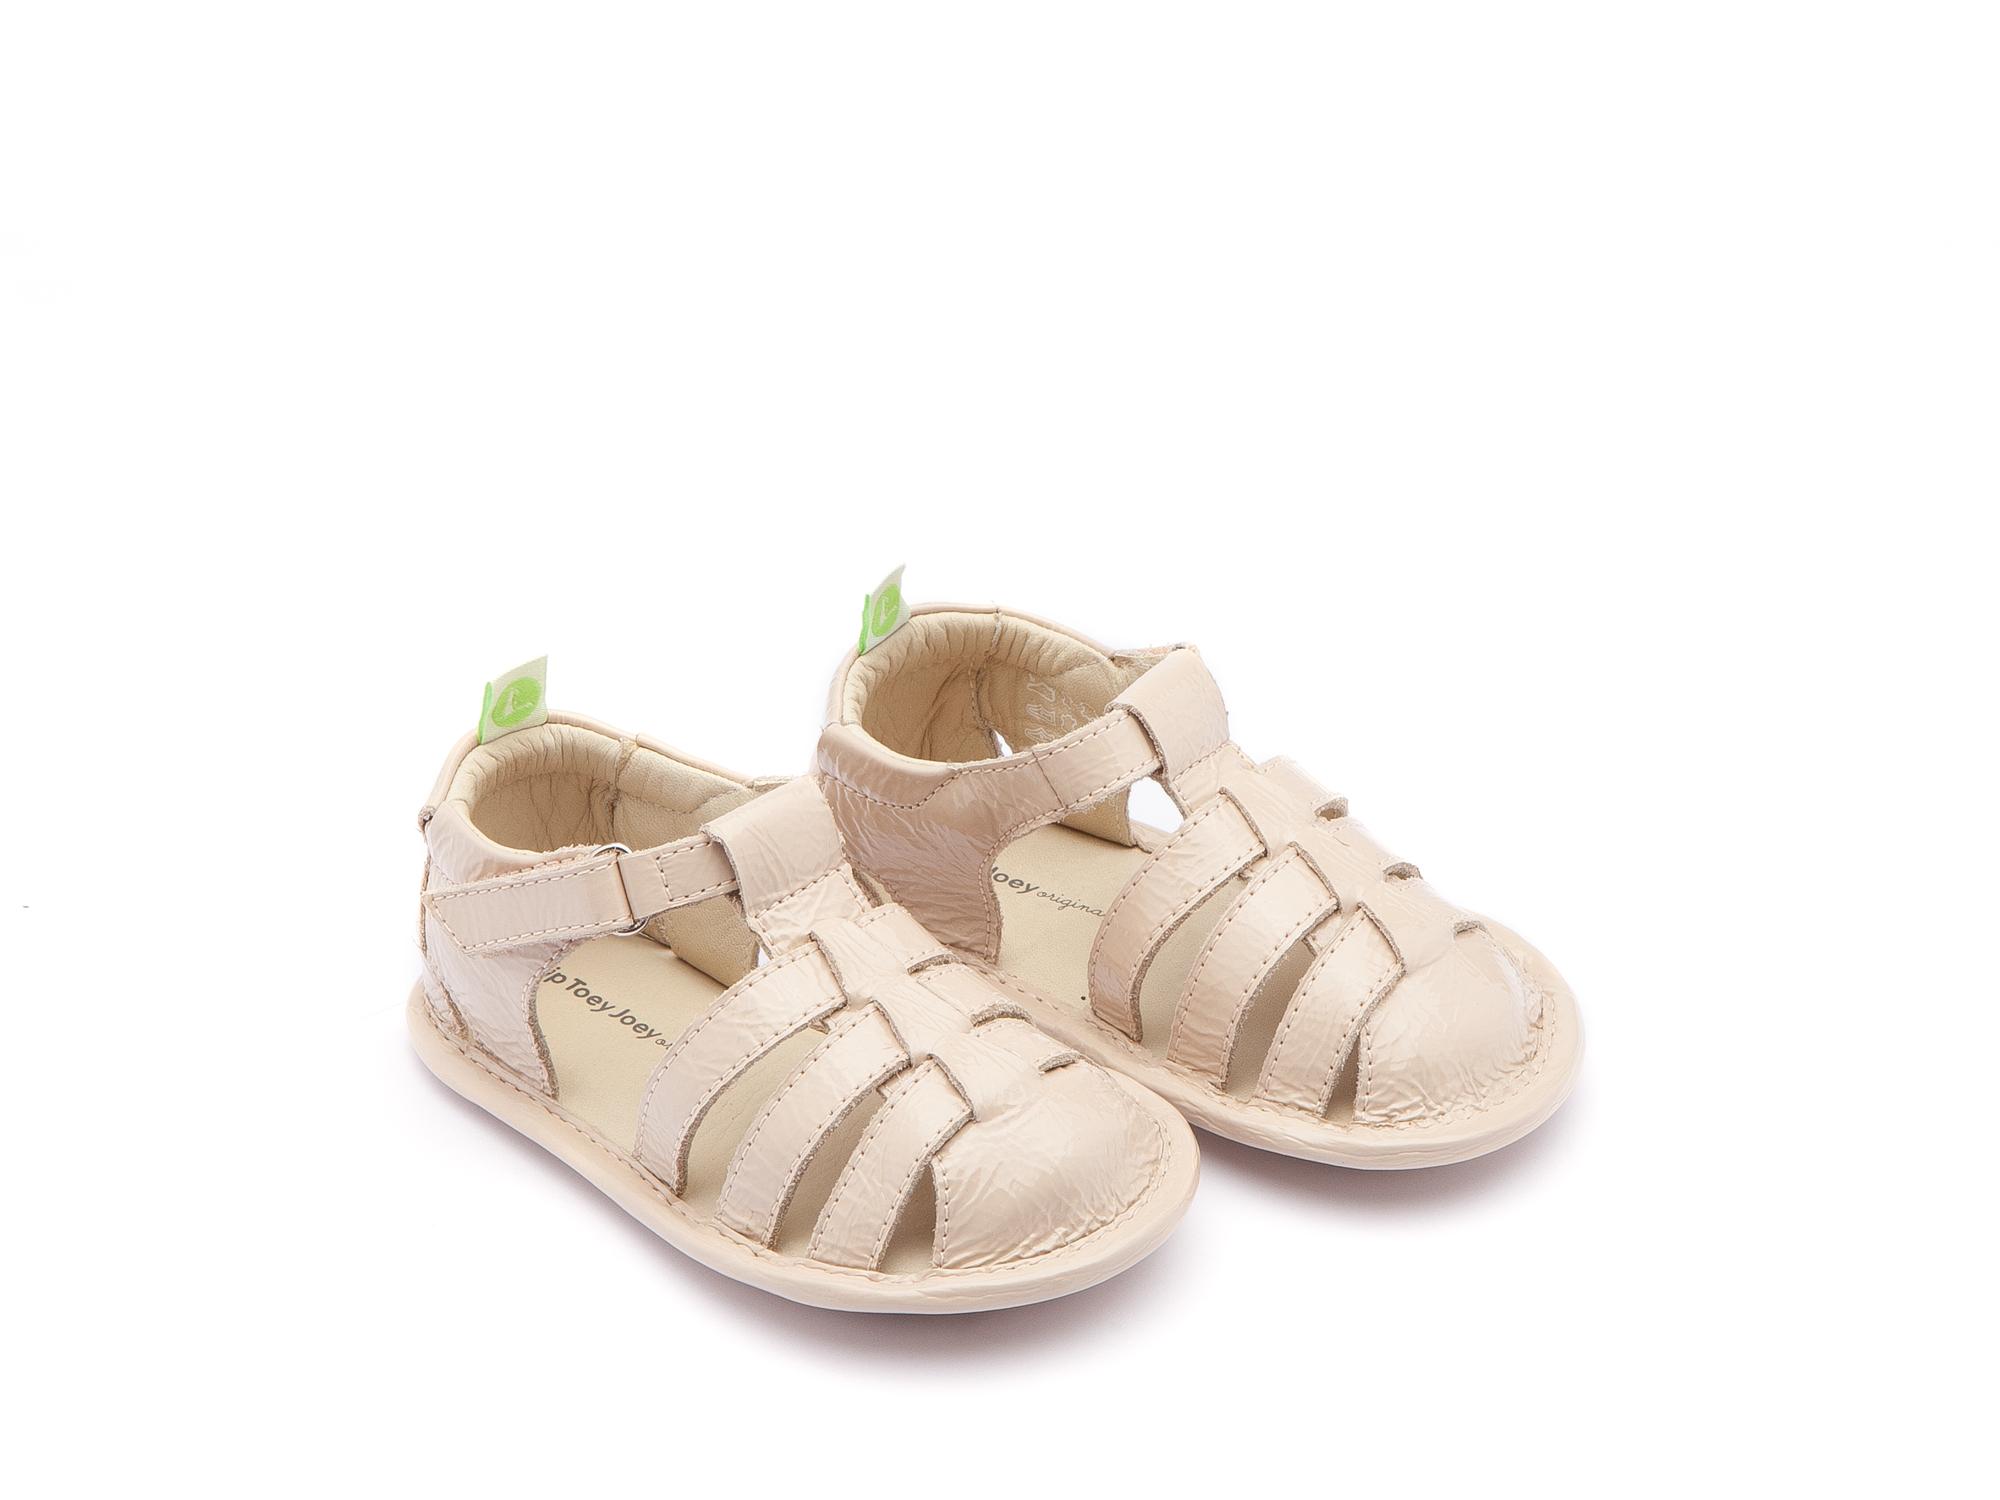 sandalia Bebê feminino minty